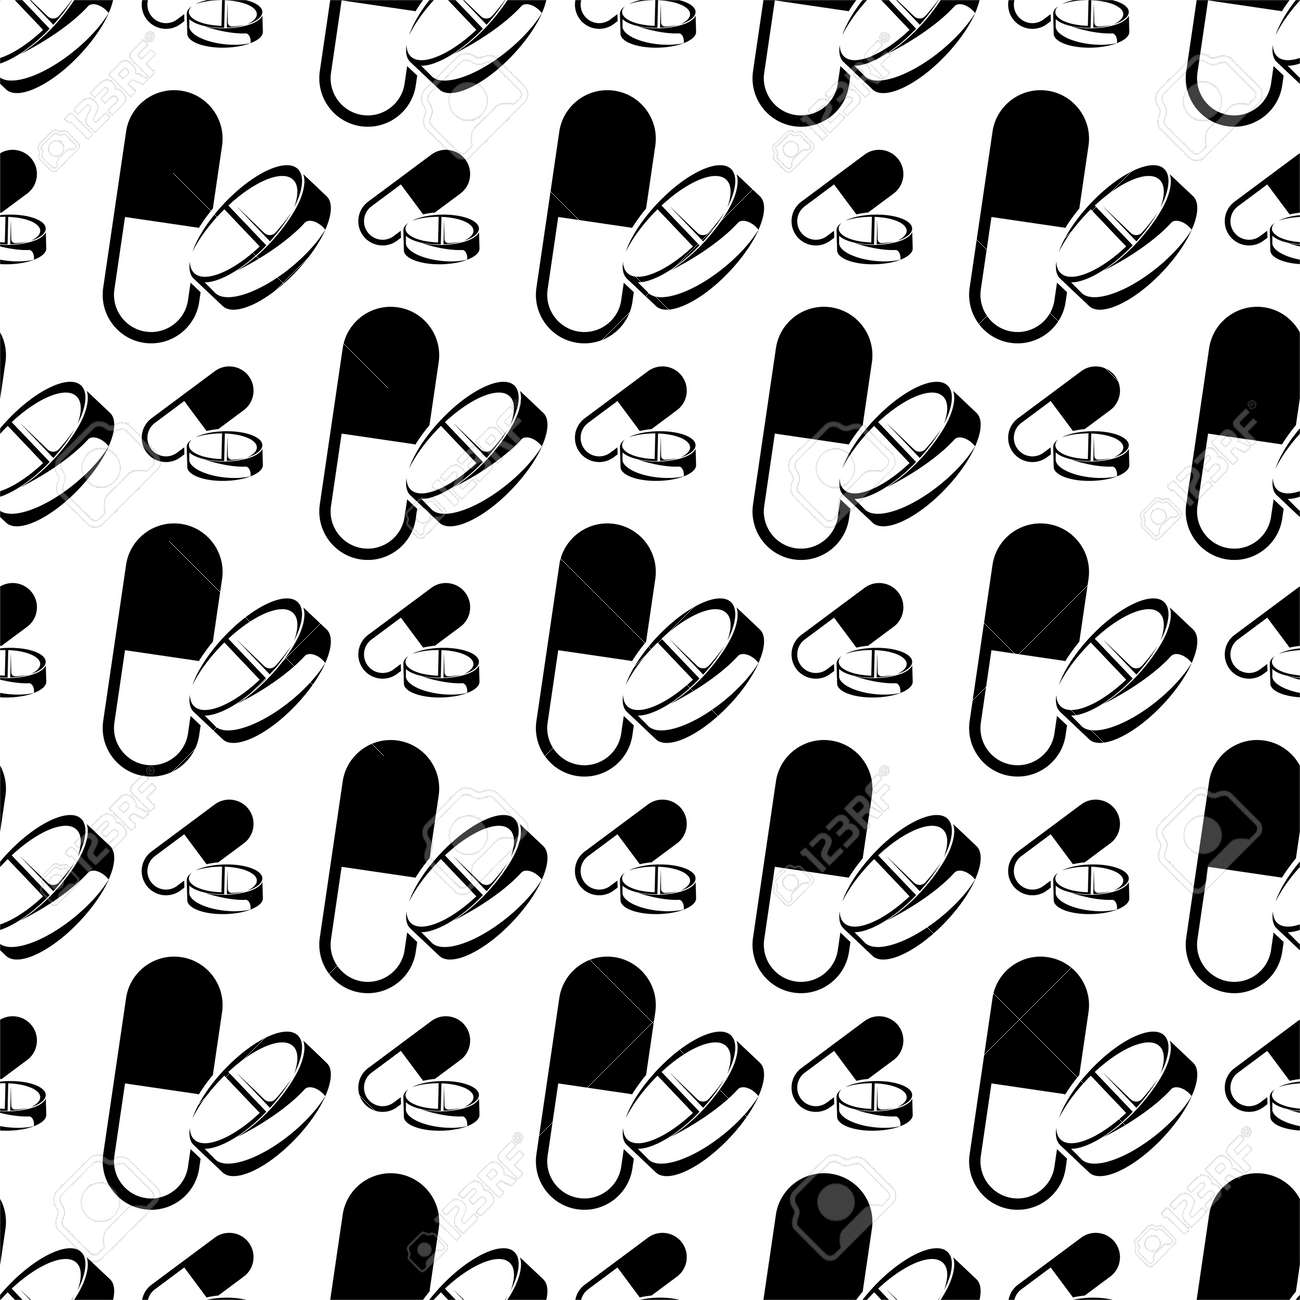 Seamless Pattern Of Capsule Pills Vector Art Illustration - 149571100